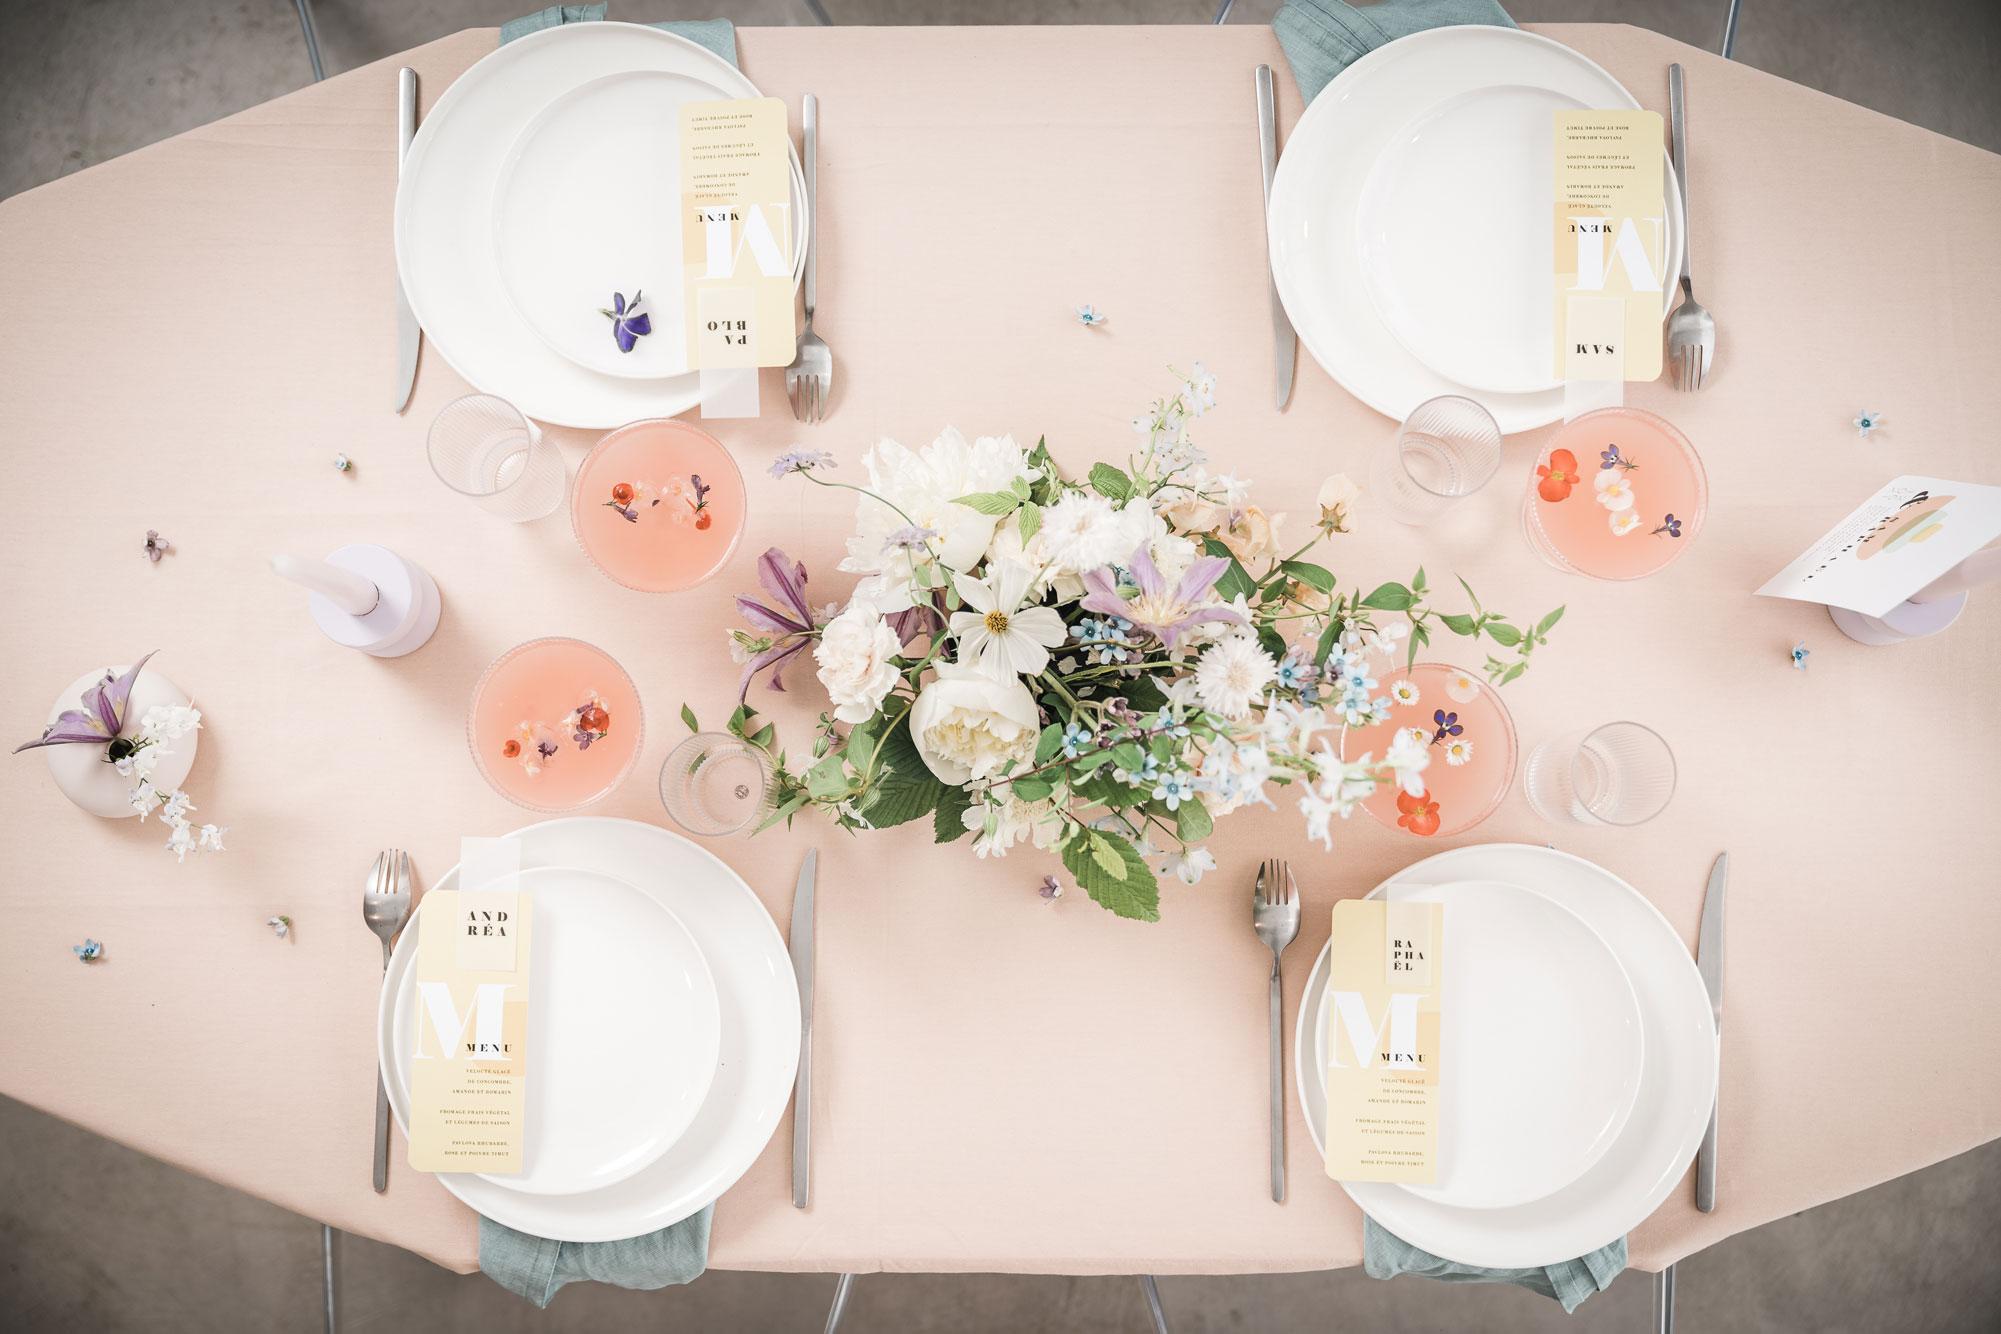 decoration table mariage moderne pastels